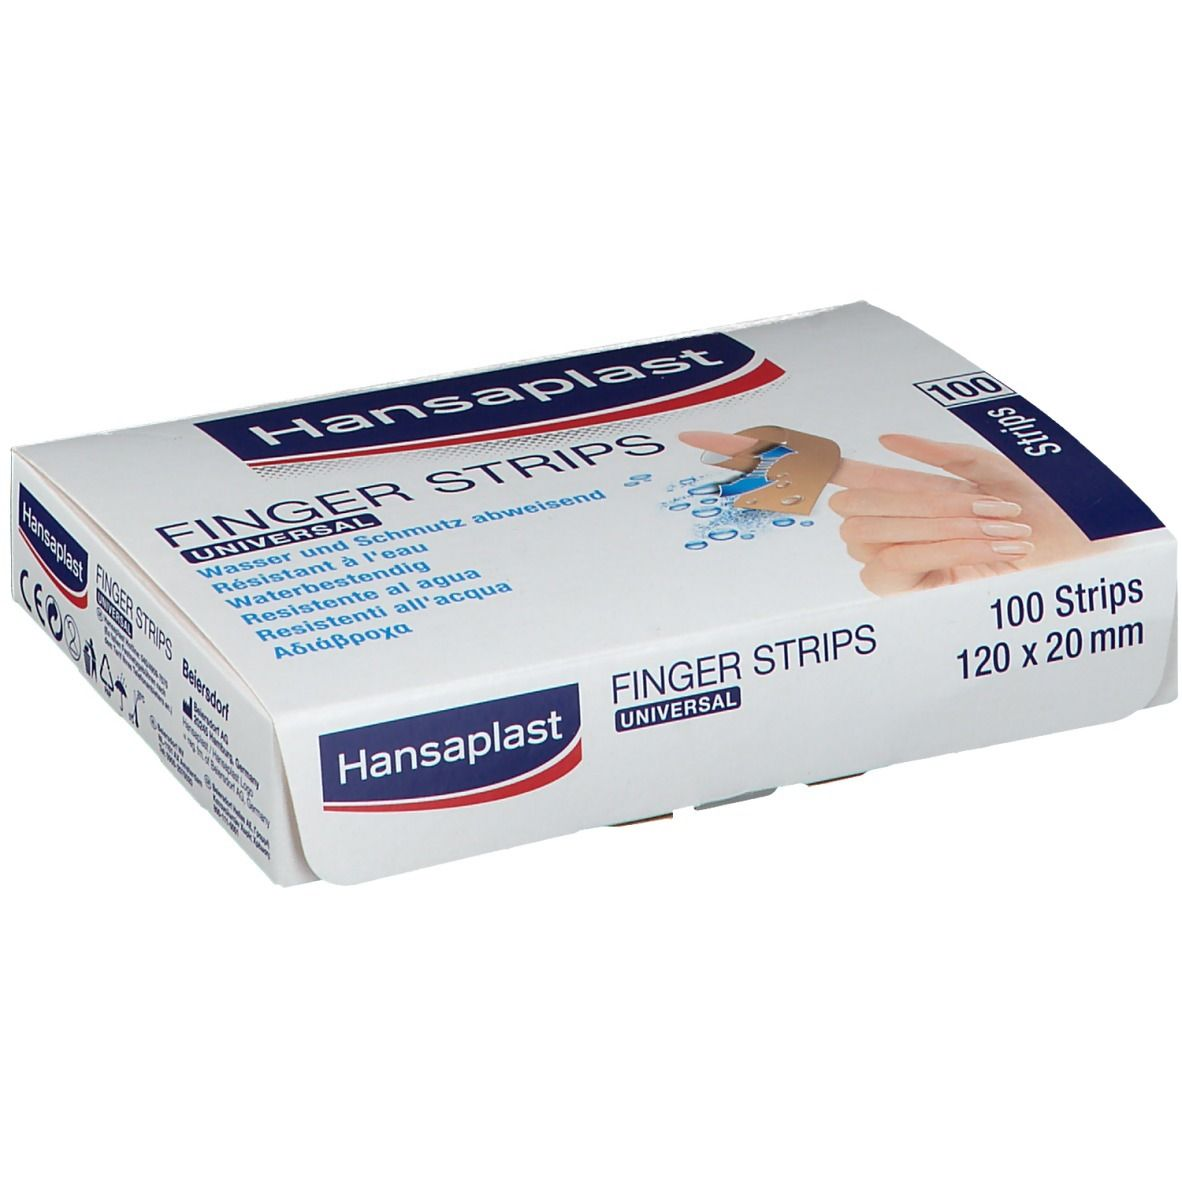 Hansaplast® Finger Strips 120 mm x 20 mm wasserfest